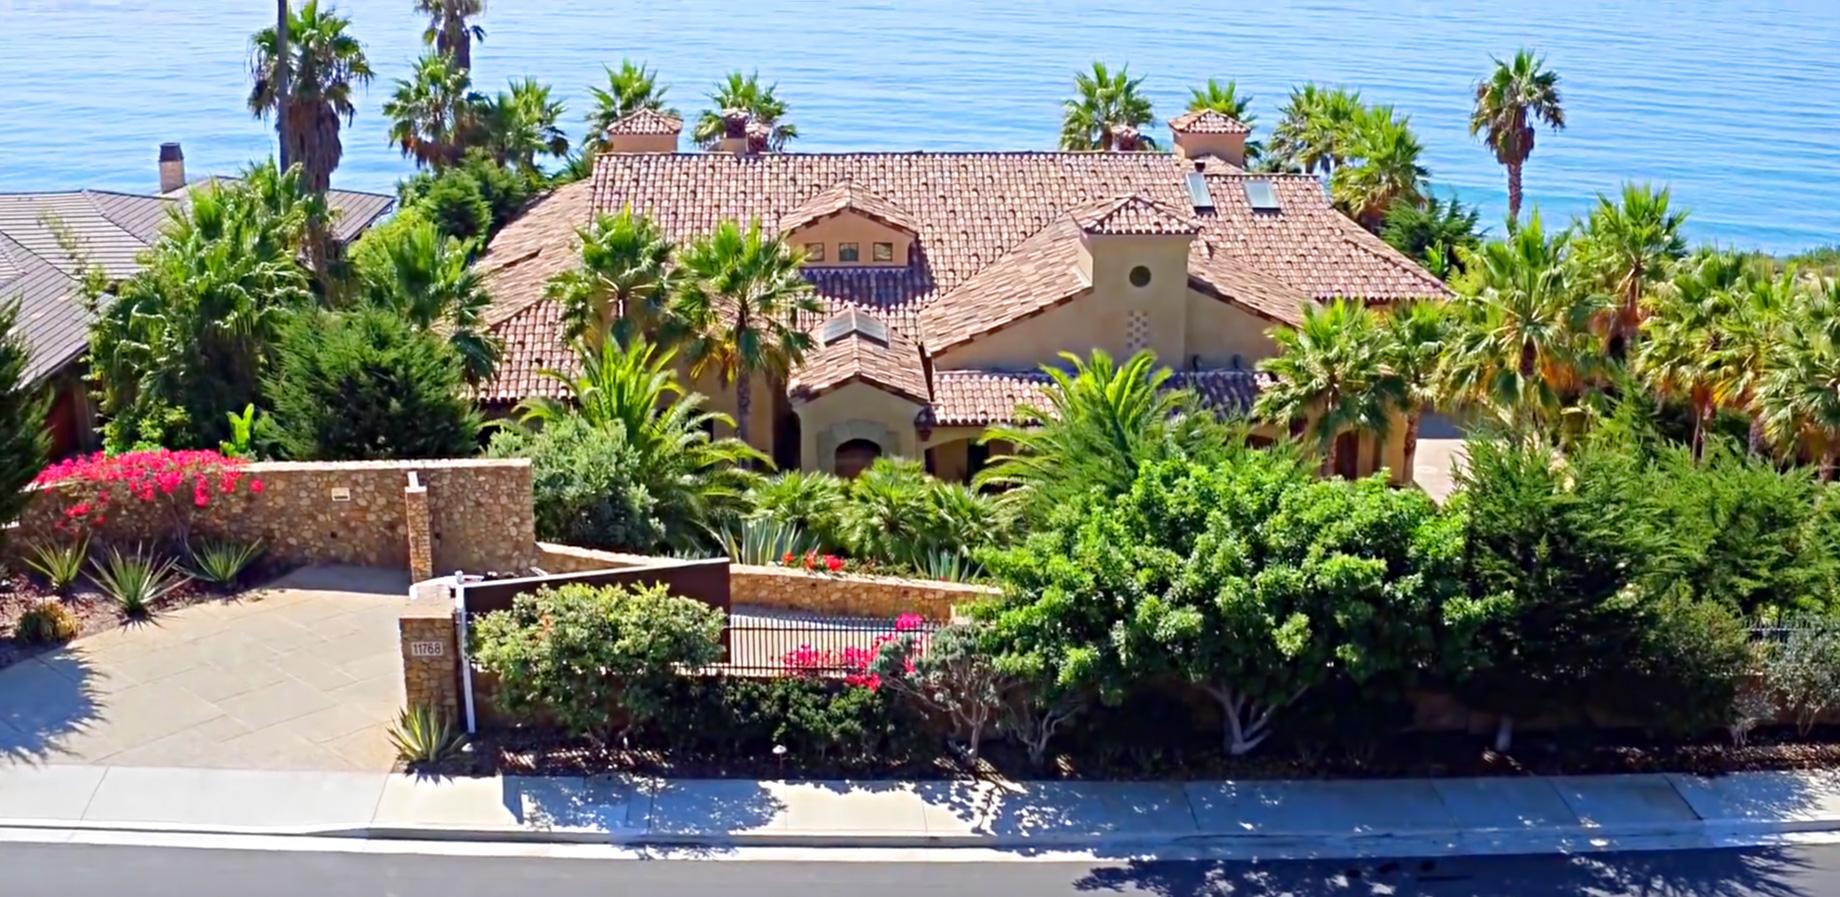 Pano - Marisol Spanish Estate - 11768 Ellice St, Malibu, CA, USA